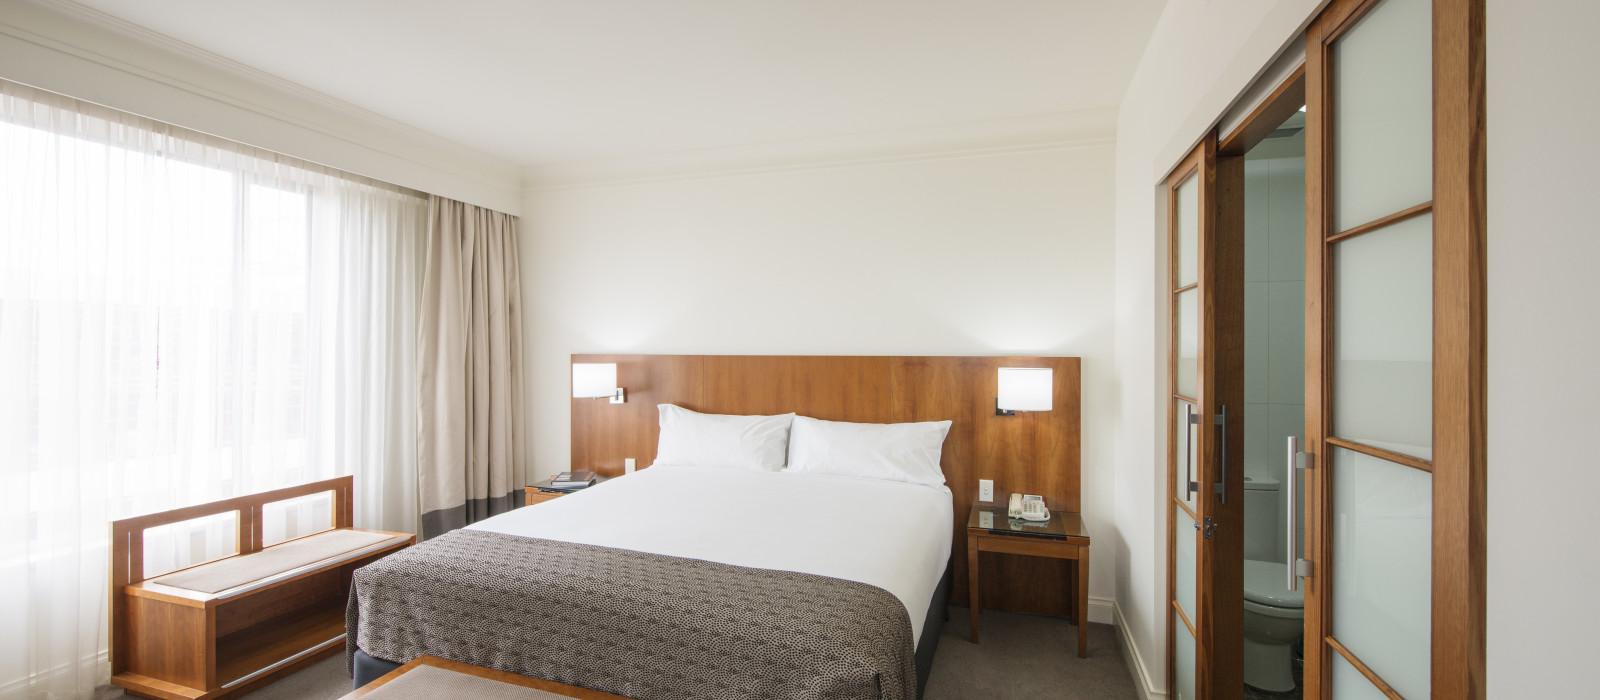 Hotel Majestic Roof Garden  Australien